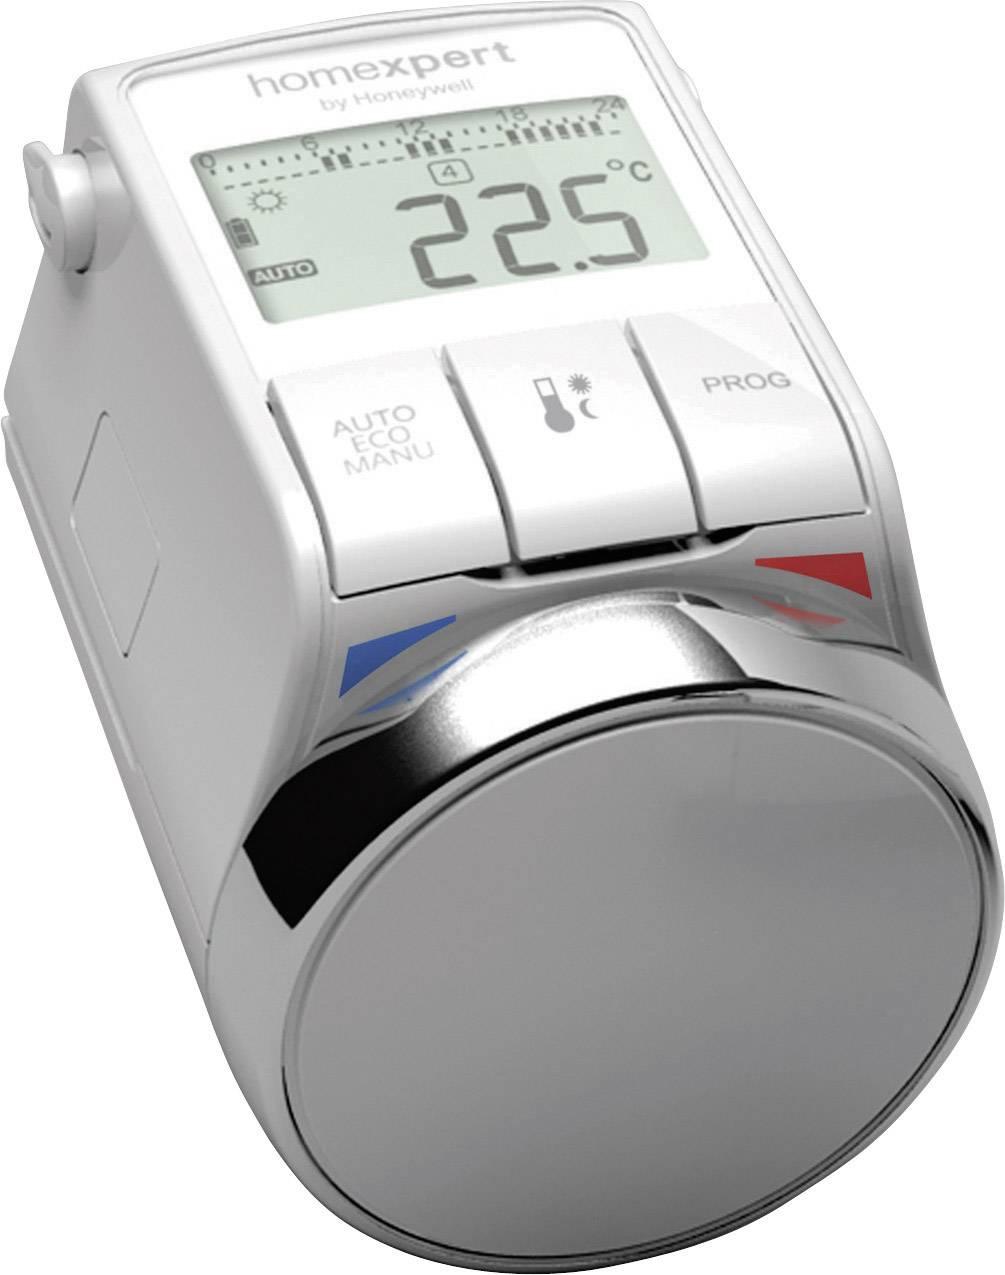 Programovatelná termostatická hlavice Honeywell HR 25 Energy, 8-28 °C